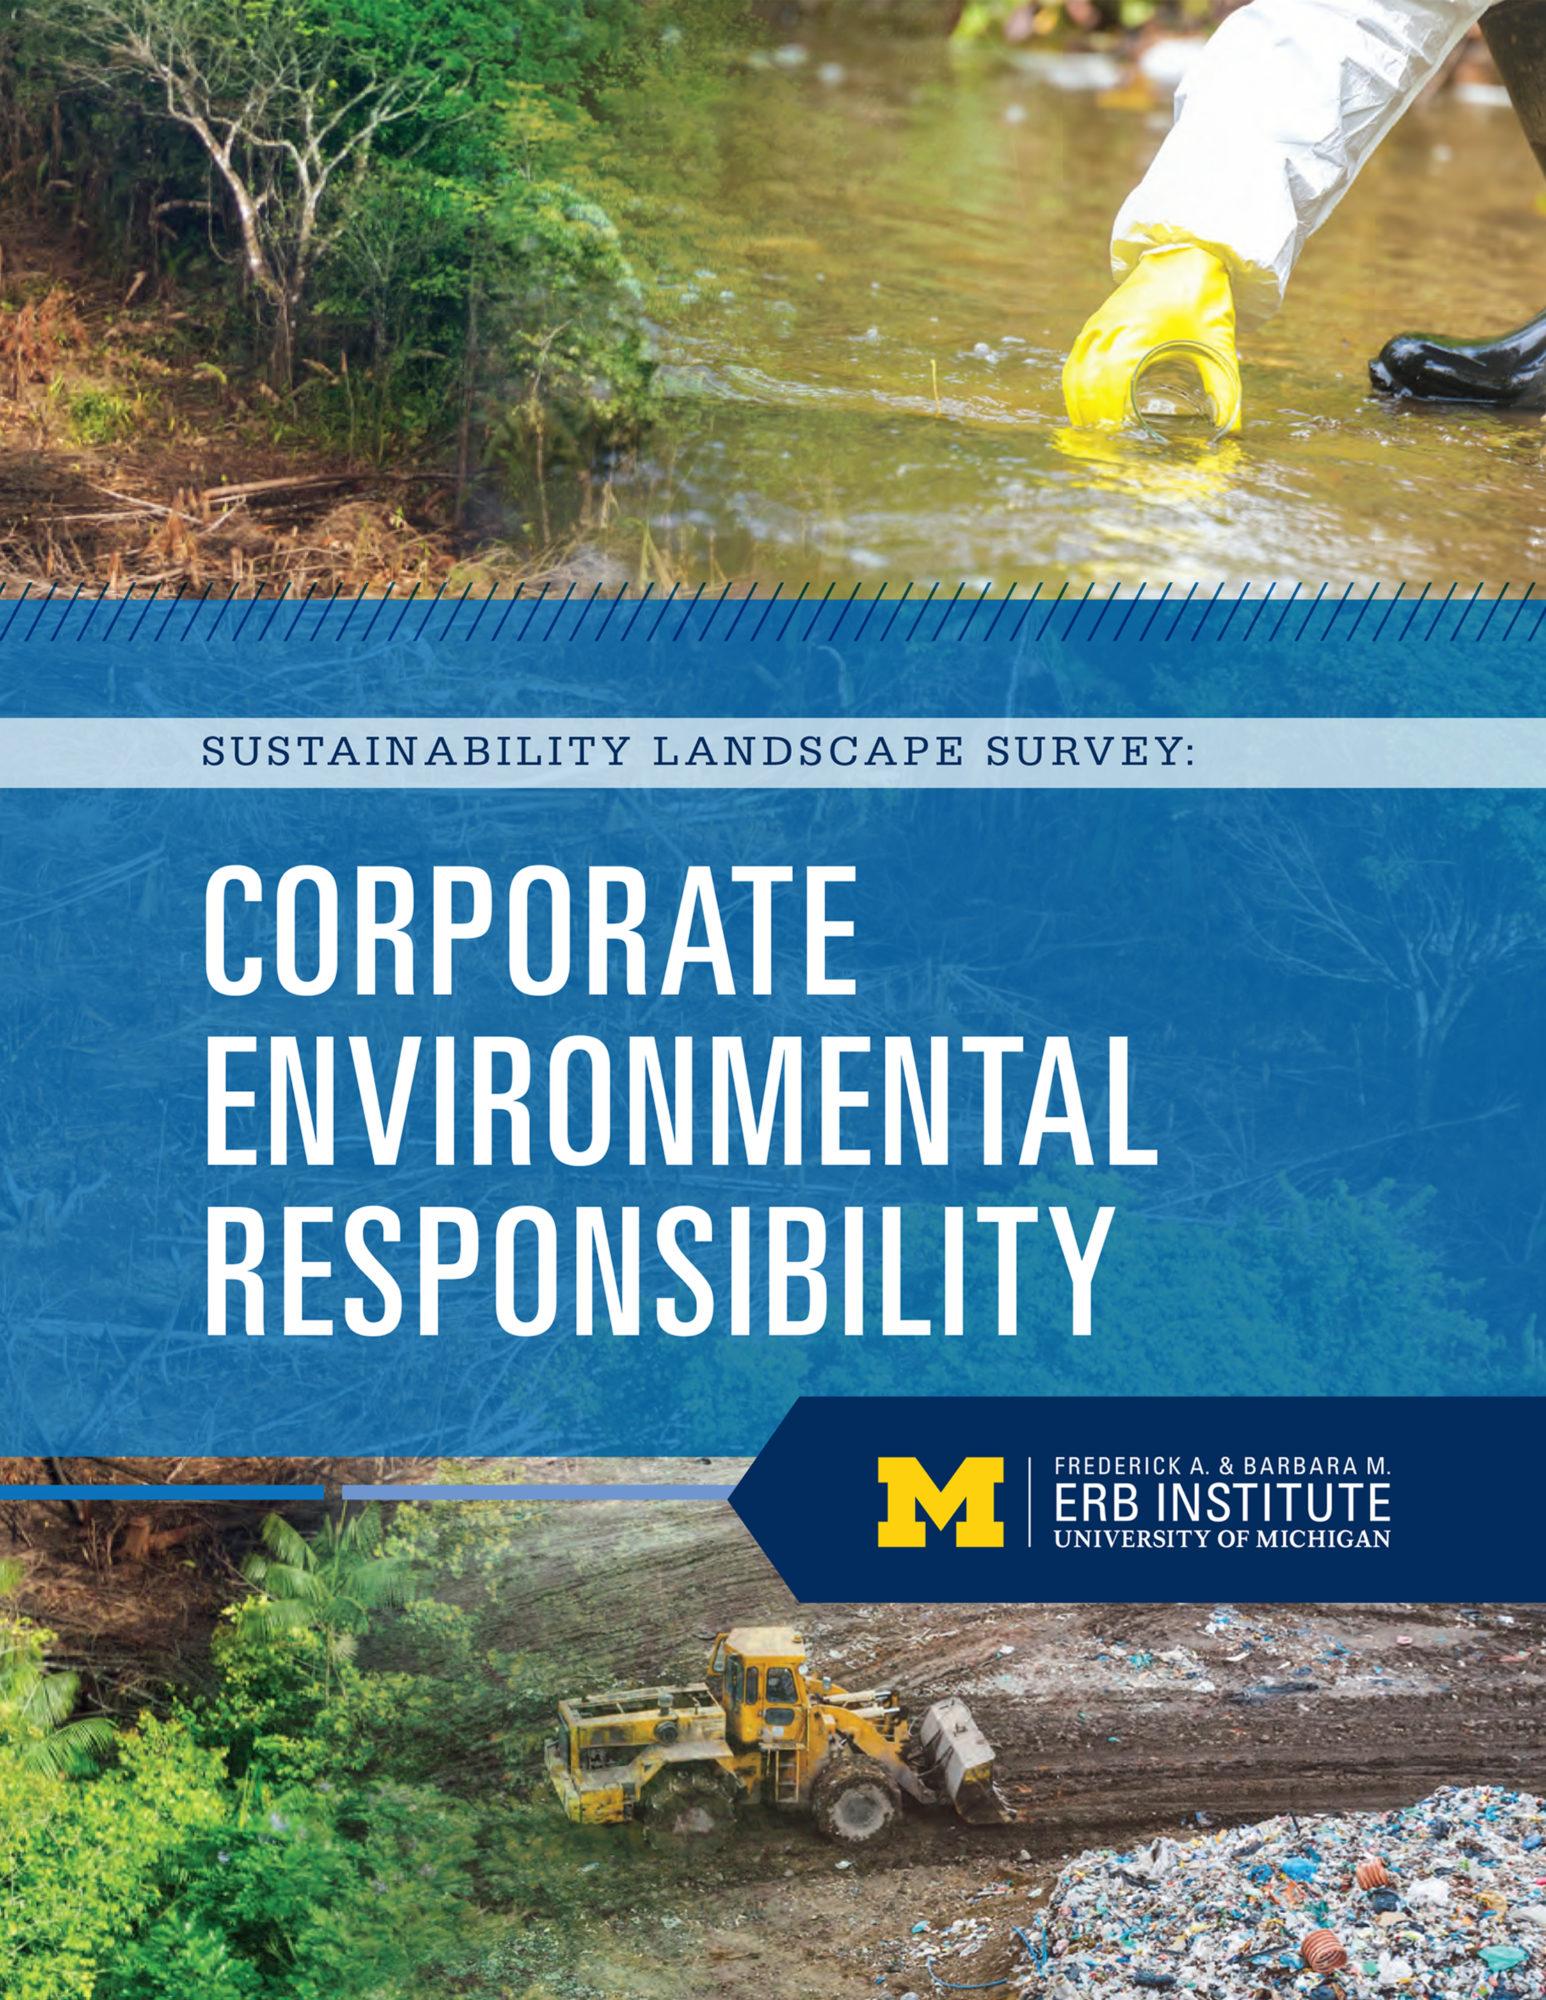 Sustainability Landscape Survey: Corporate Environmental Responsibility